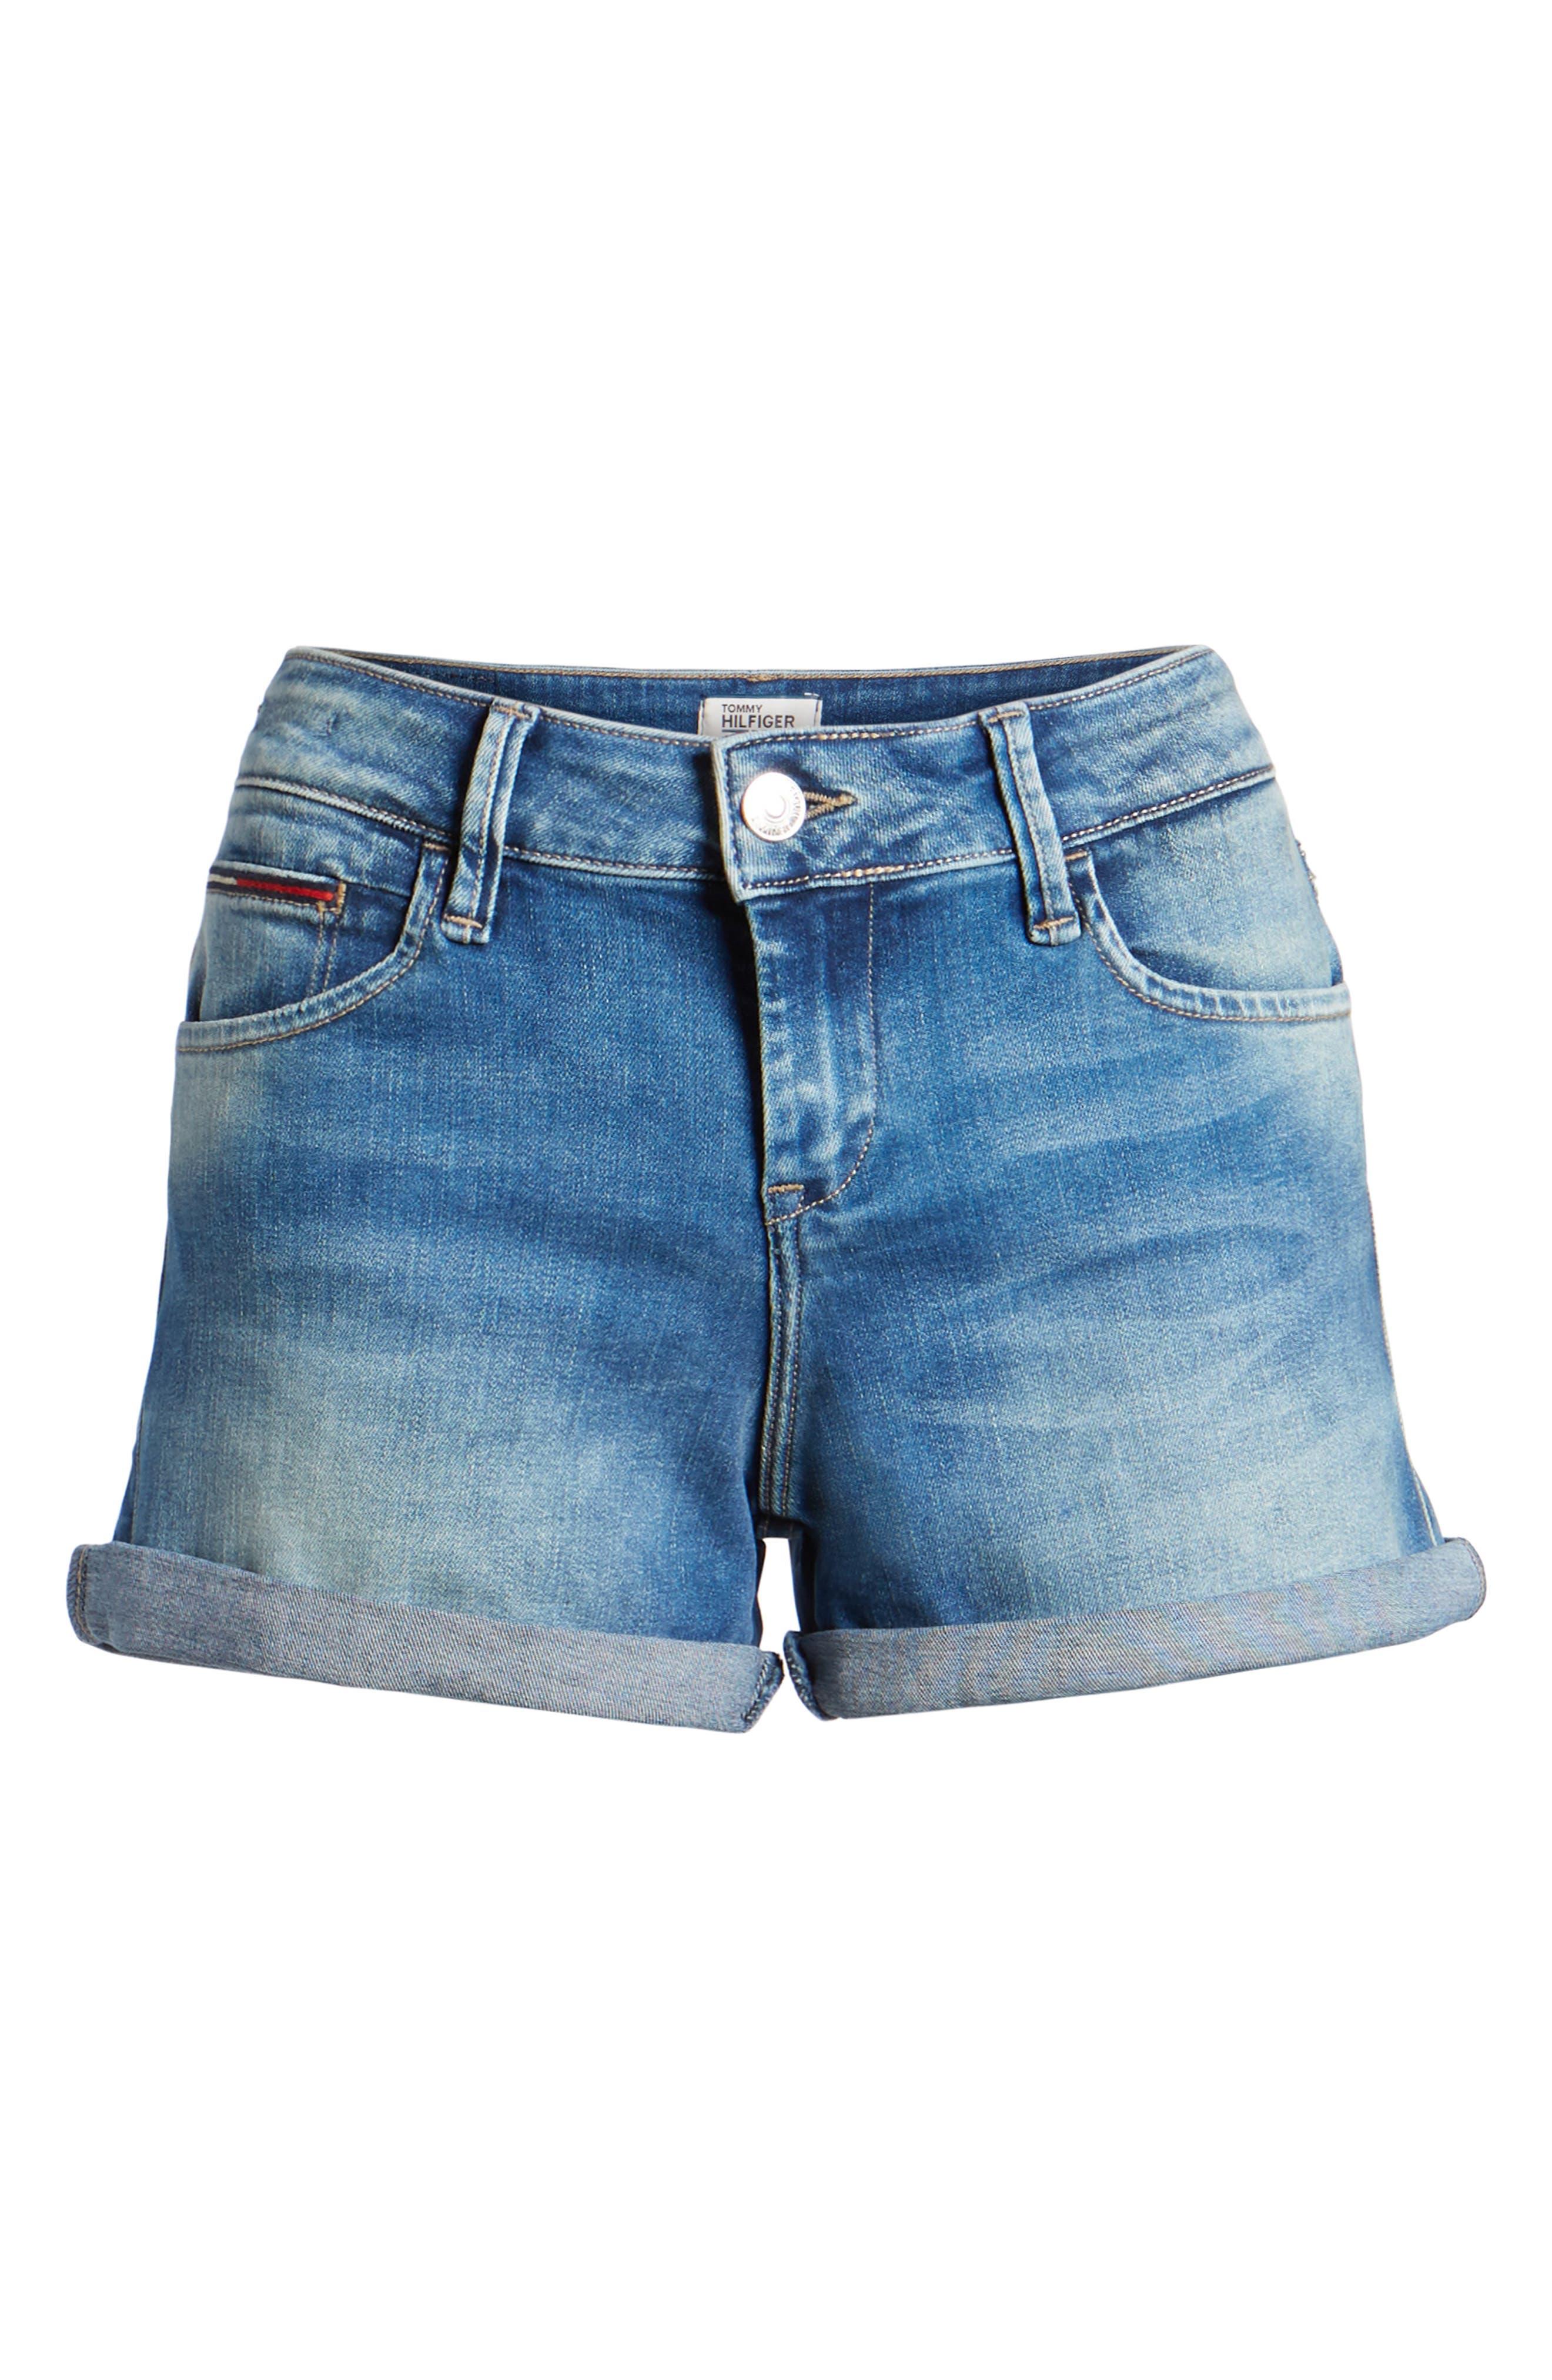 Cuffed Denim Shorts,                             Alternate thumbnail 7, color,                             Florida Light Blue Stretch